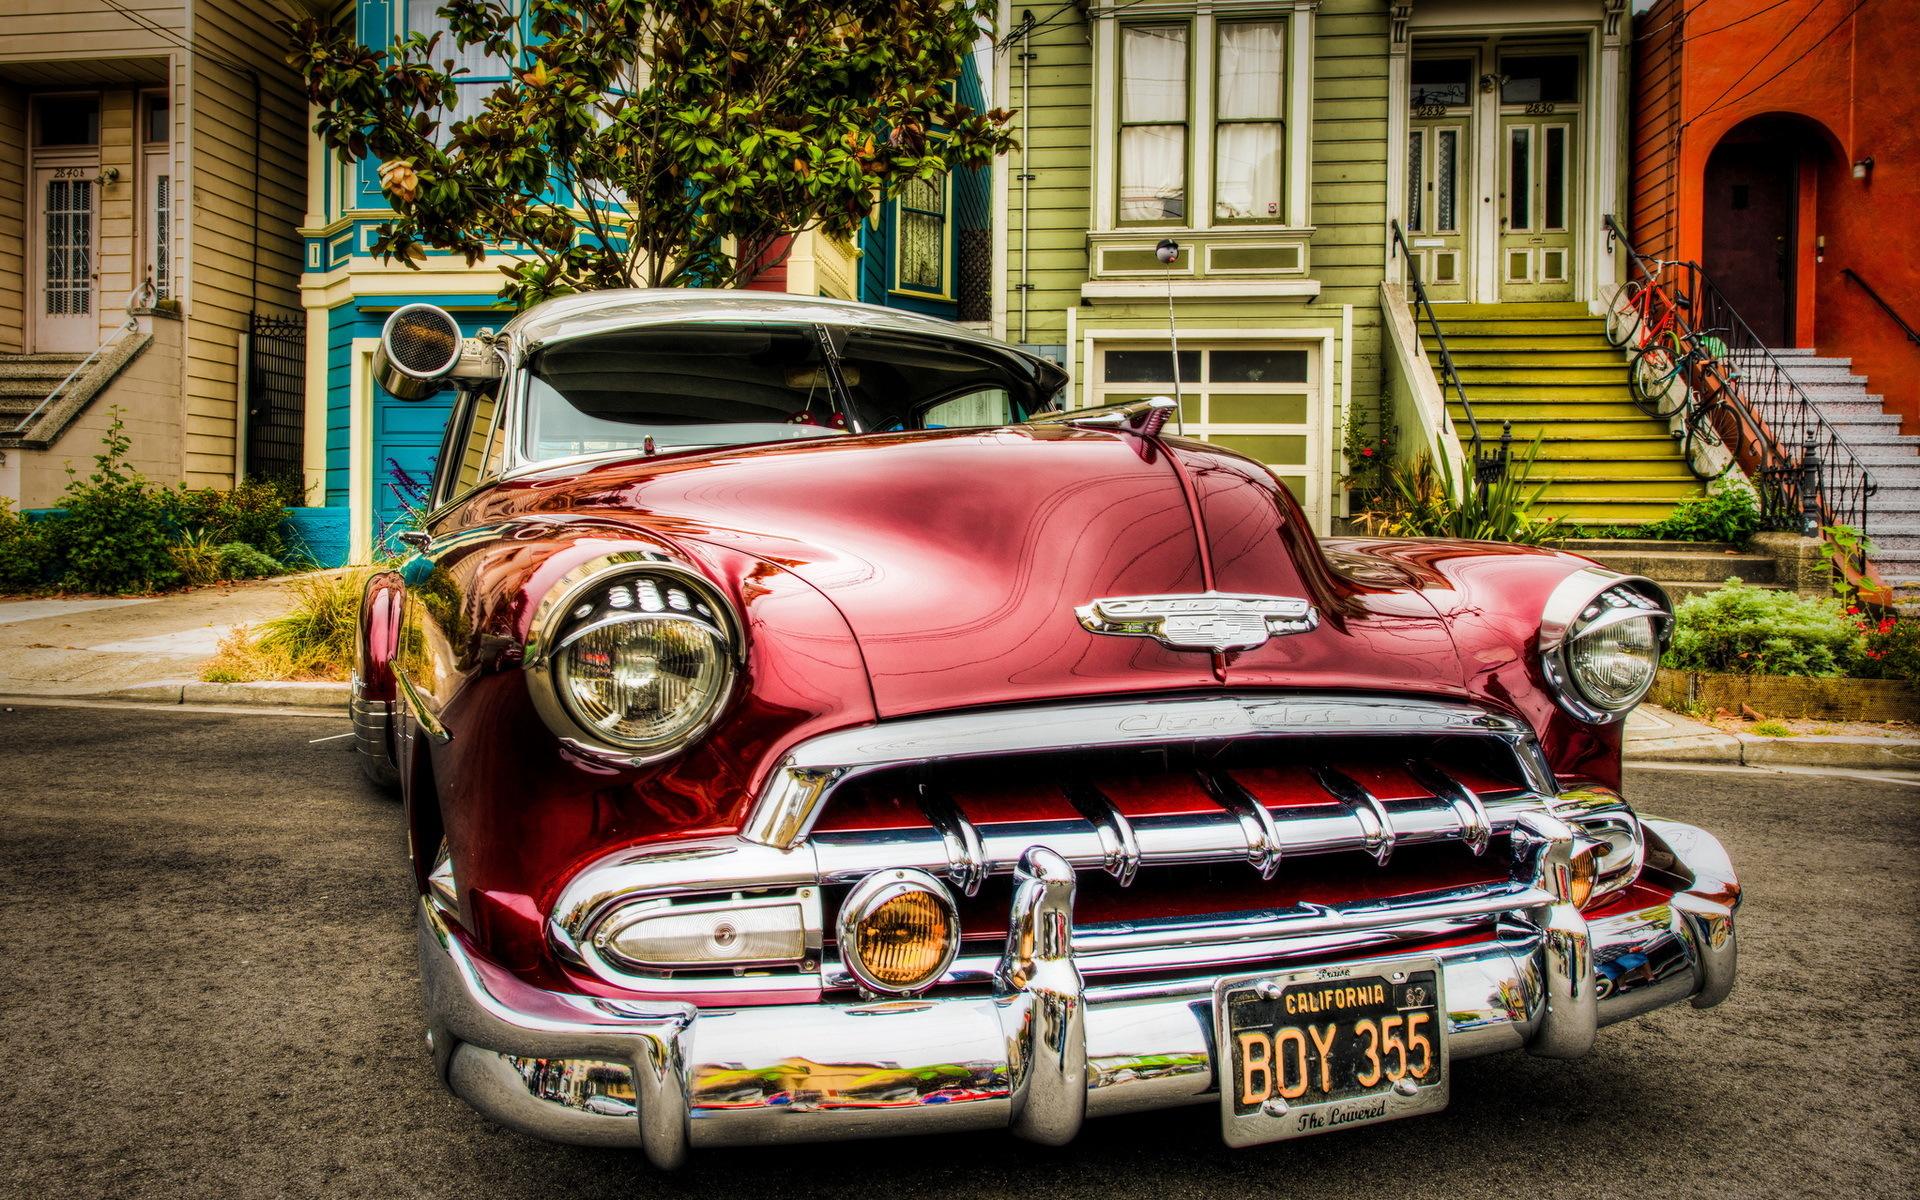 Vintage Chevrolet HD Cars 4k Wallpapers Images Backgrounds